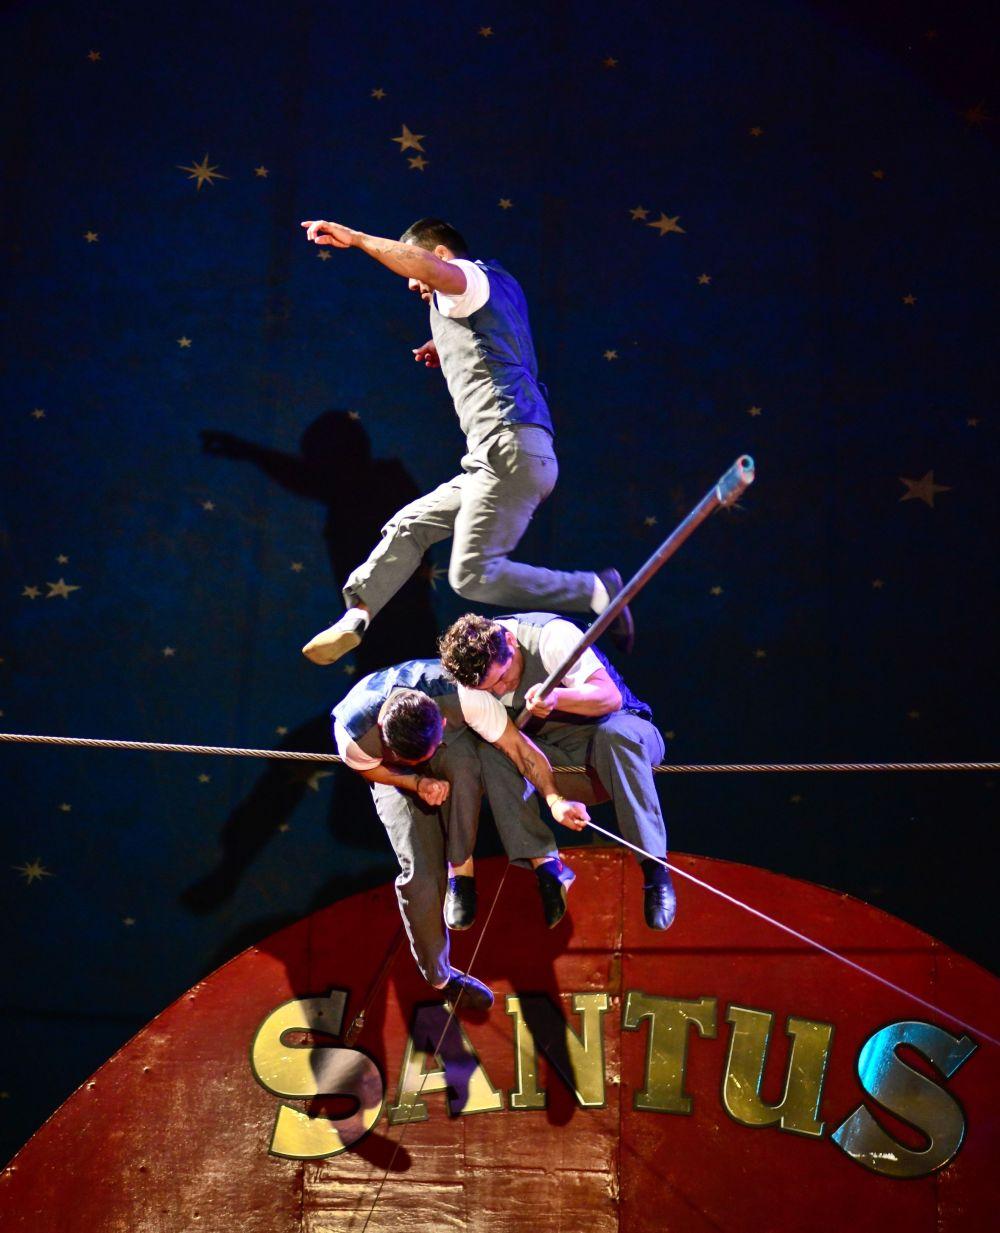 Hermanos Rodriguez high wire Santus Circus 2019